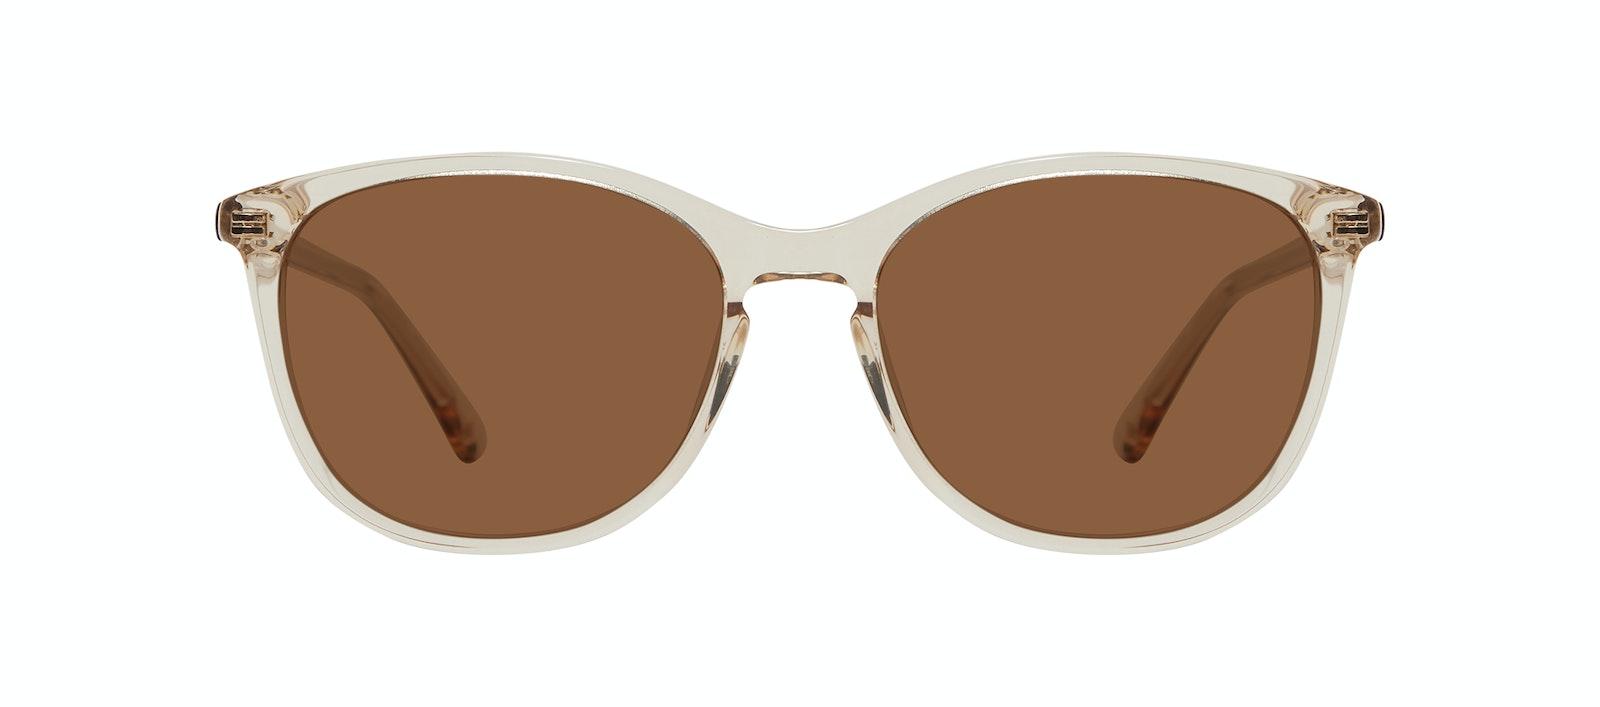 Affordable Fashion Glasses Rectangle Square Round Sunglasses Women Nadine S Prosecco Front